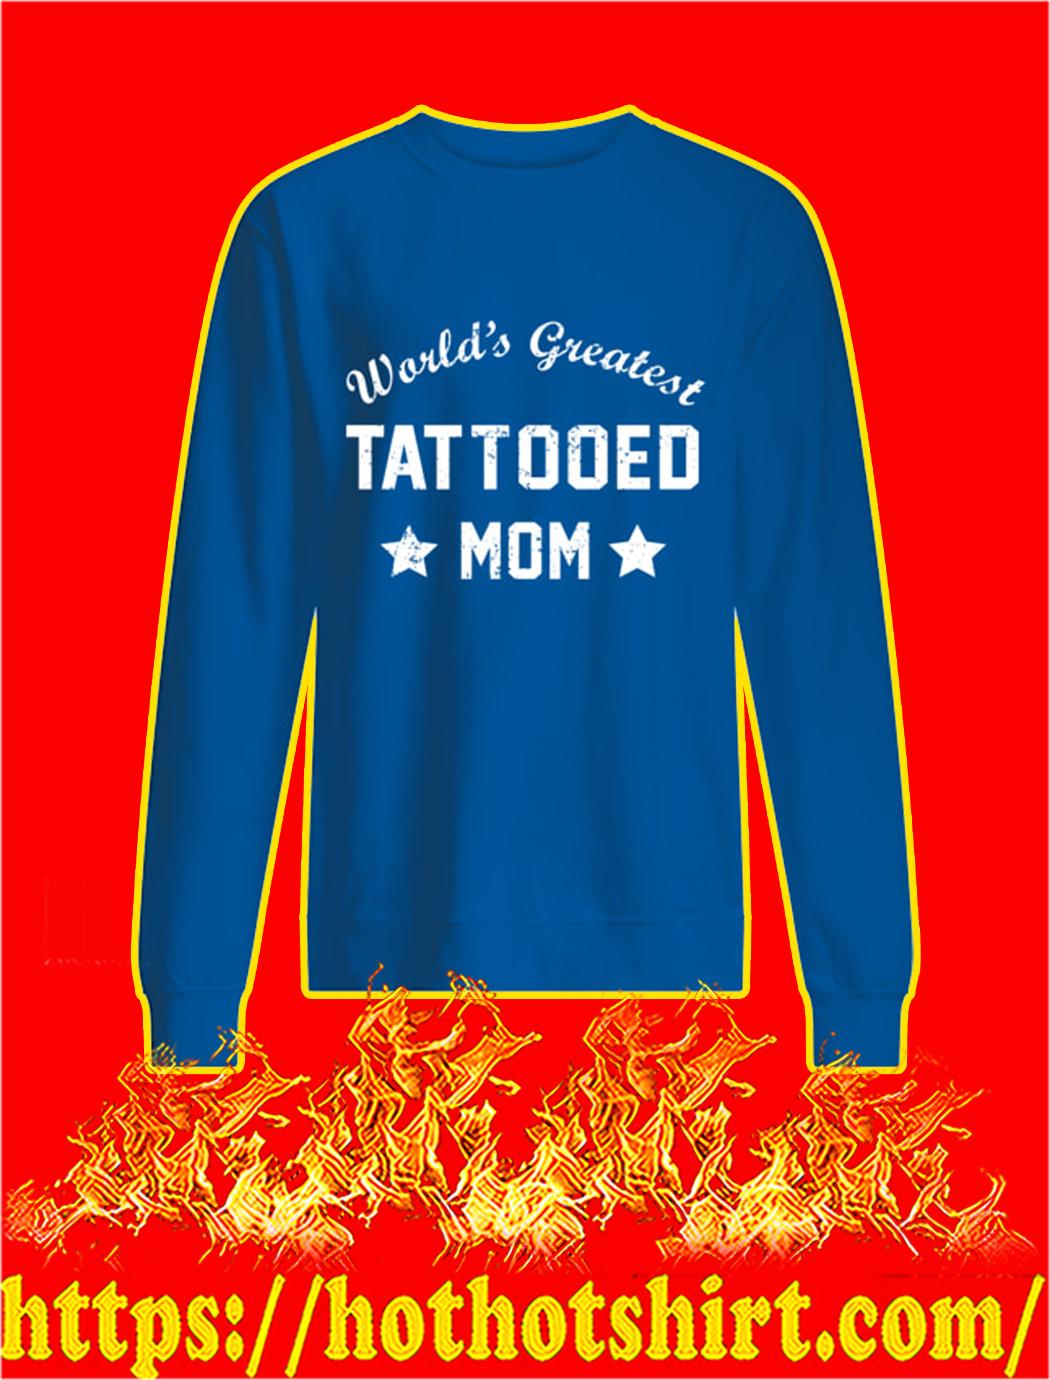 World's Greatest Tattooed Mom sweatshirt